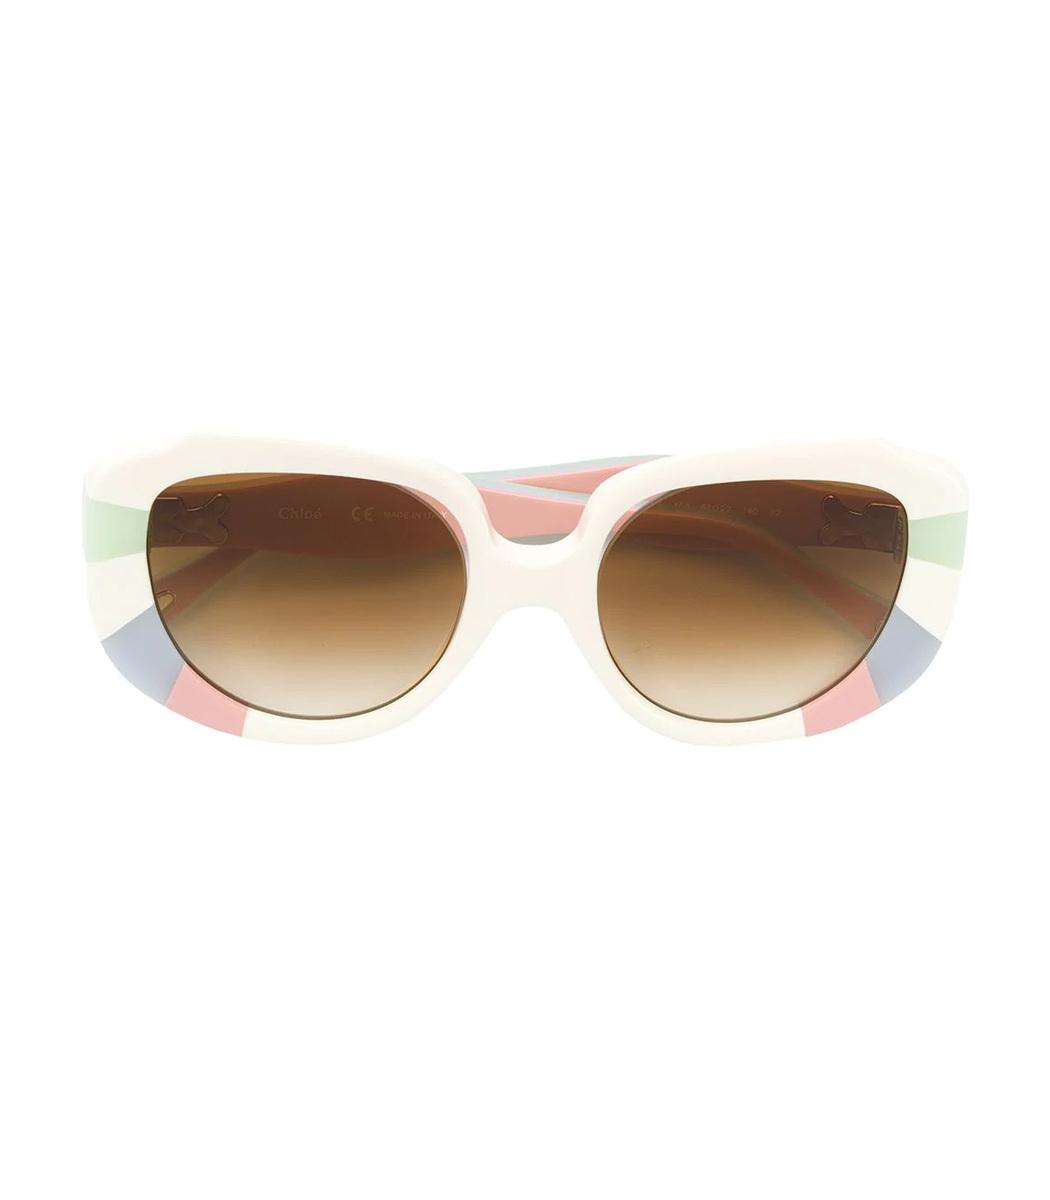 8eccb40c652 Chloé Venus Colour Block Cat Eye Sunglasses - ShopBAZAAR